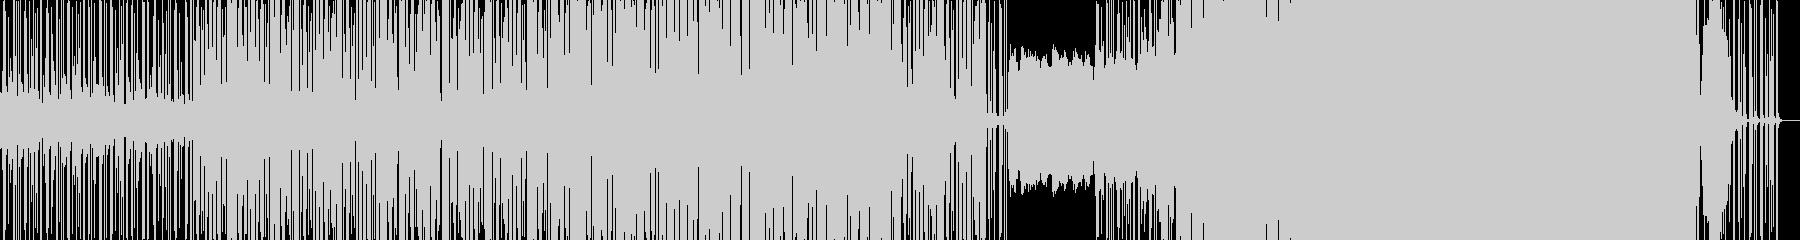 Dark/Electronica/の未再生の波形